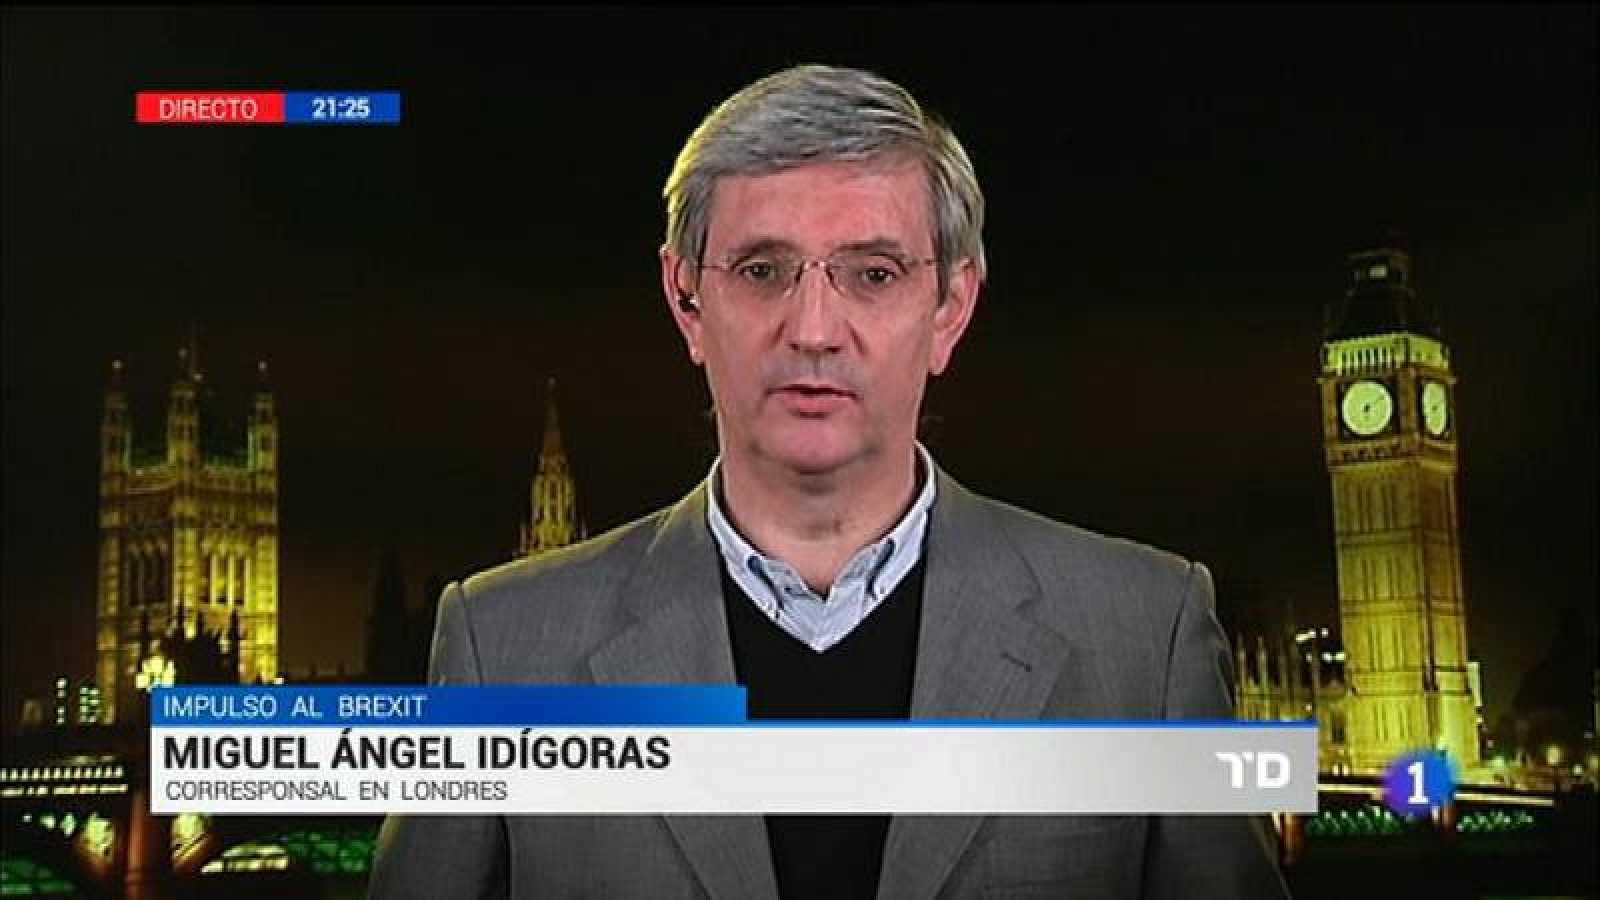 Miguel Ángel Idígoras